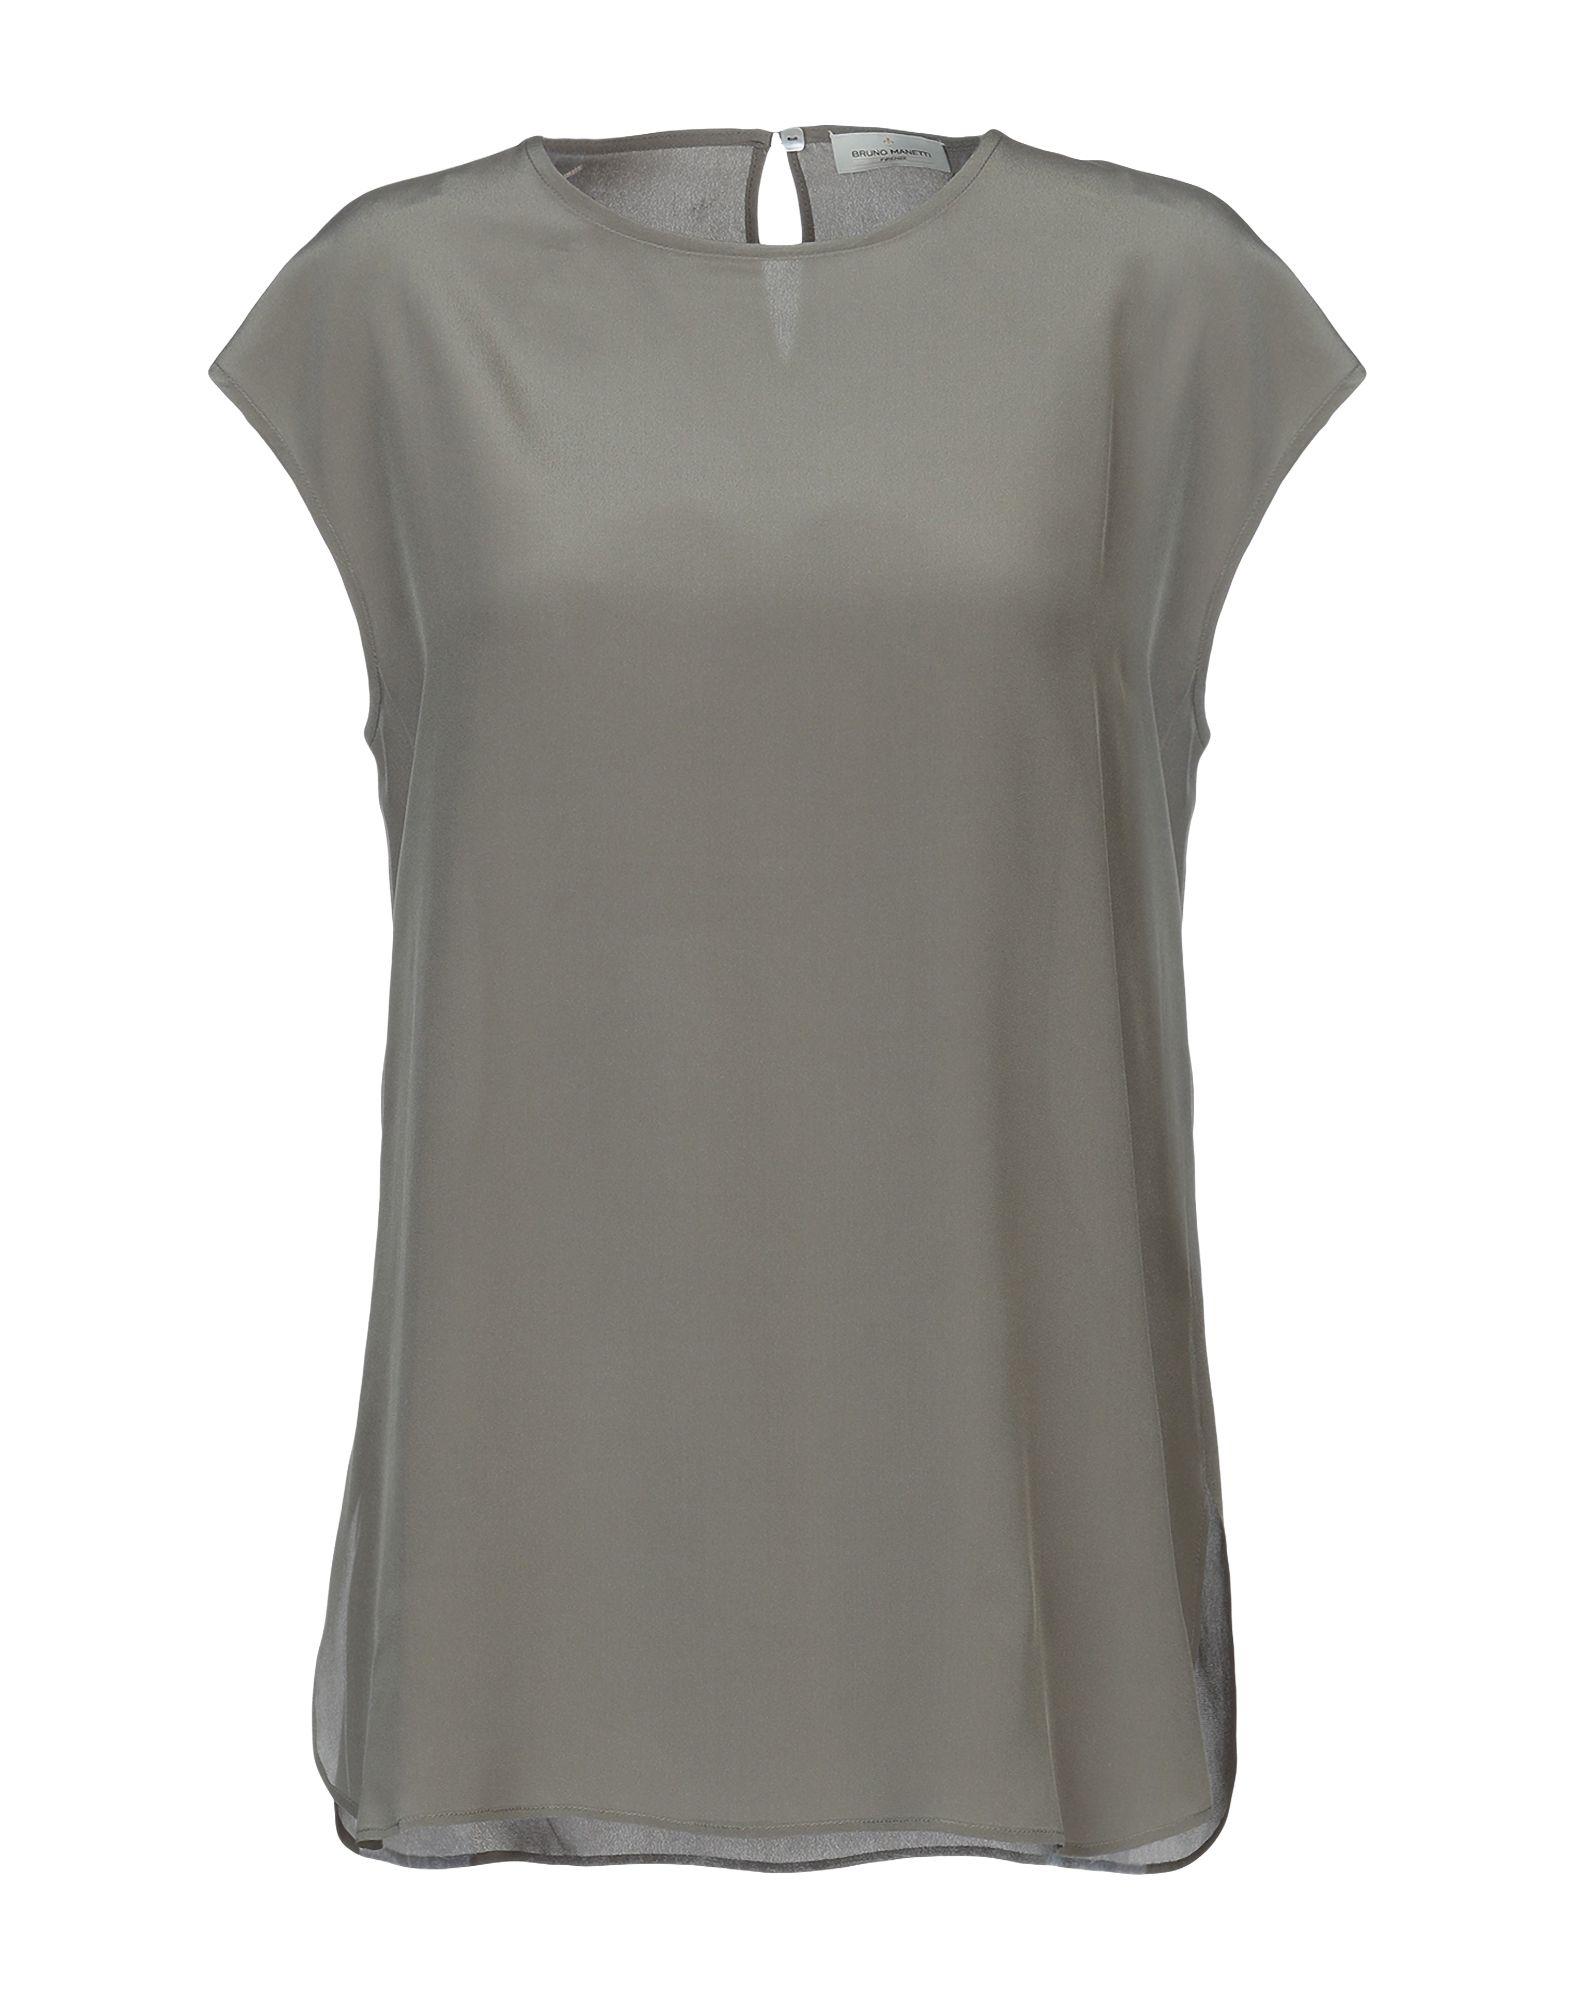 BRUNO MANETTI Блузка блузка с рисунком короткие рукава вырез сзади